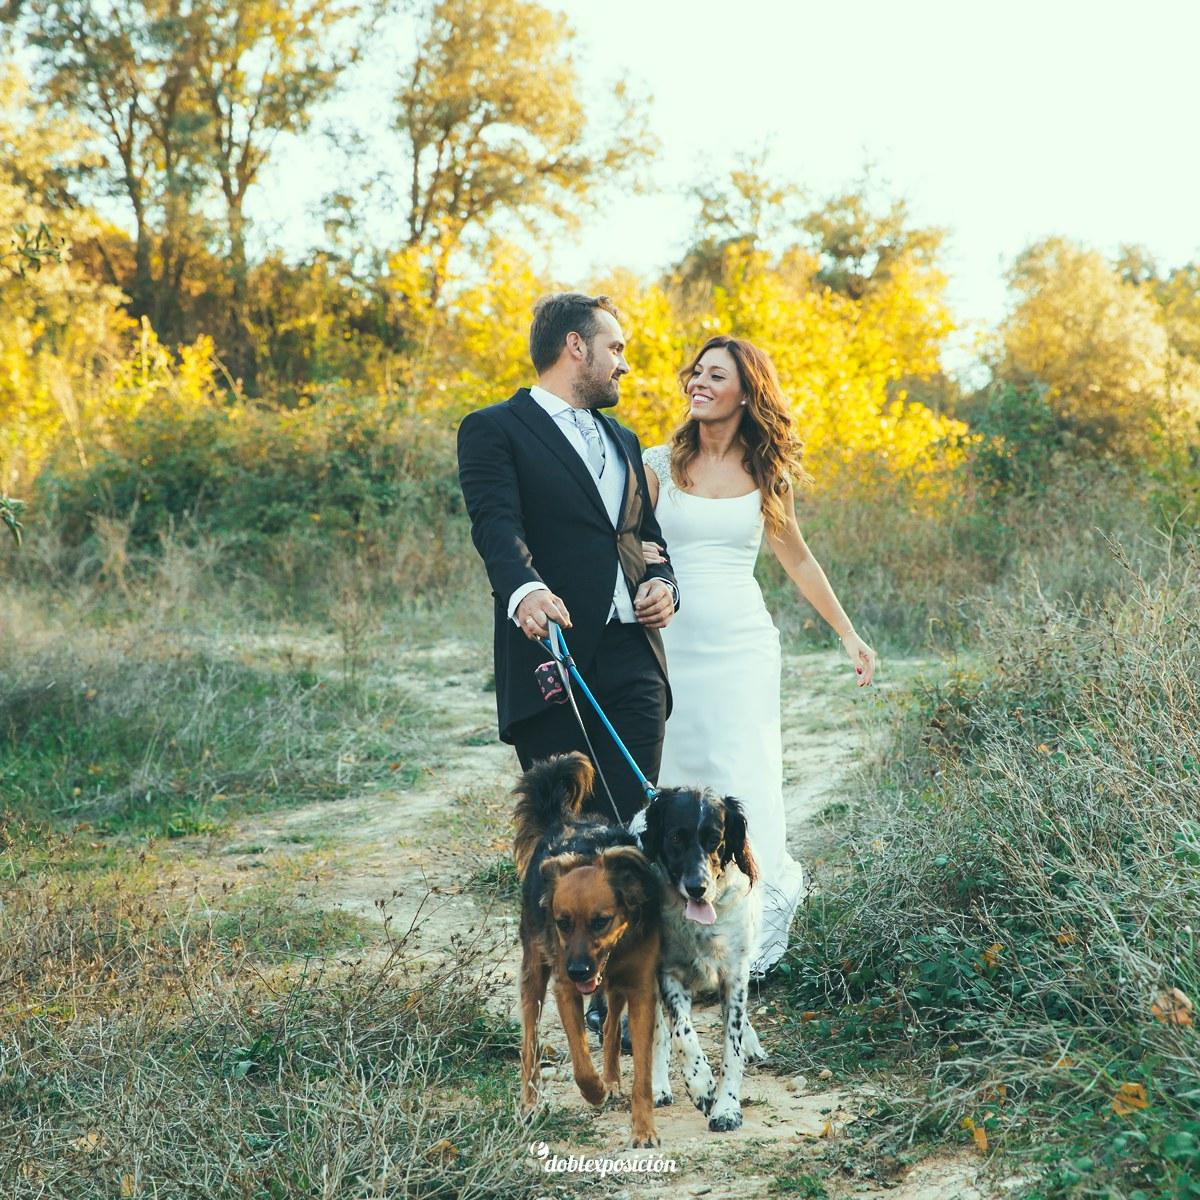 fotografos-boda-elche-alicante-reportaje-bosque-postboda-003